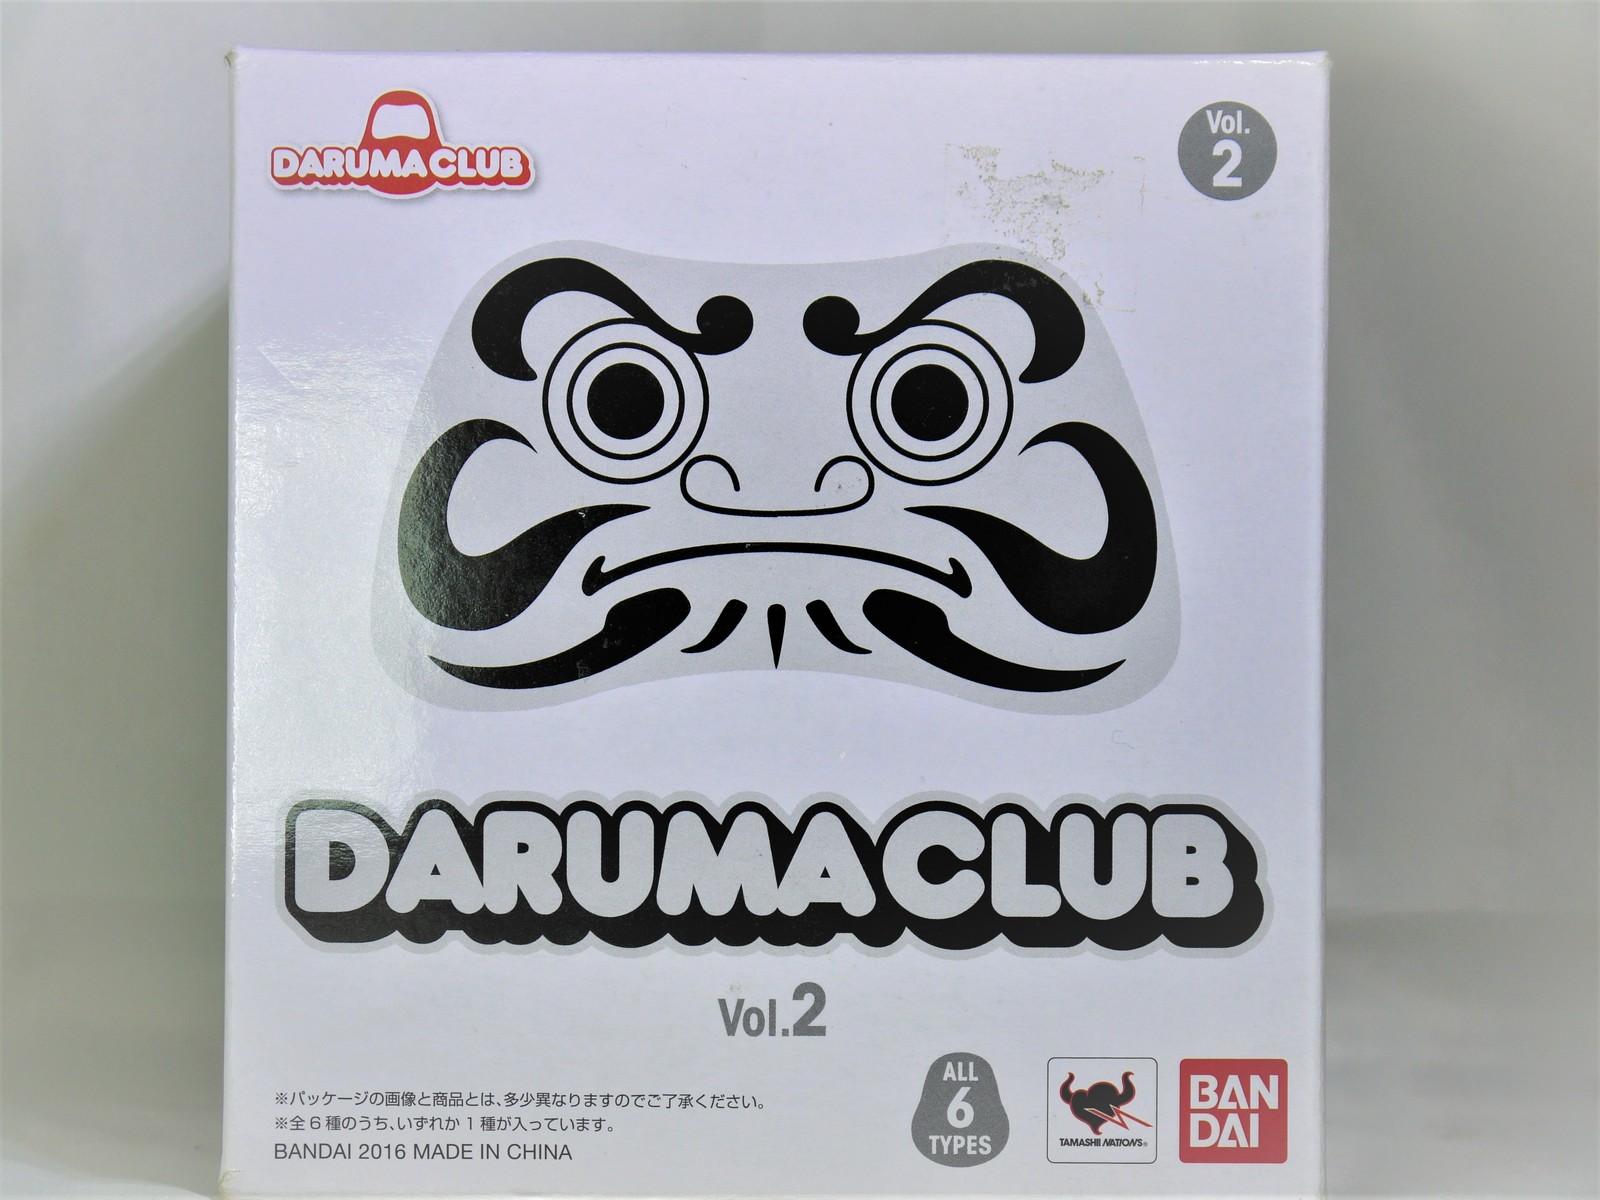 BANDAI DARUMA CLUB Volume 2 SUMO DARUMA FIGURE WHITE